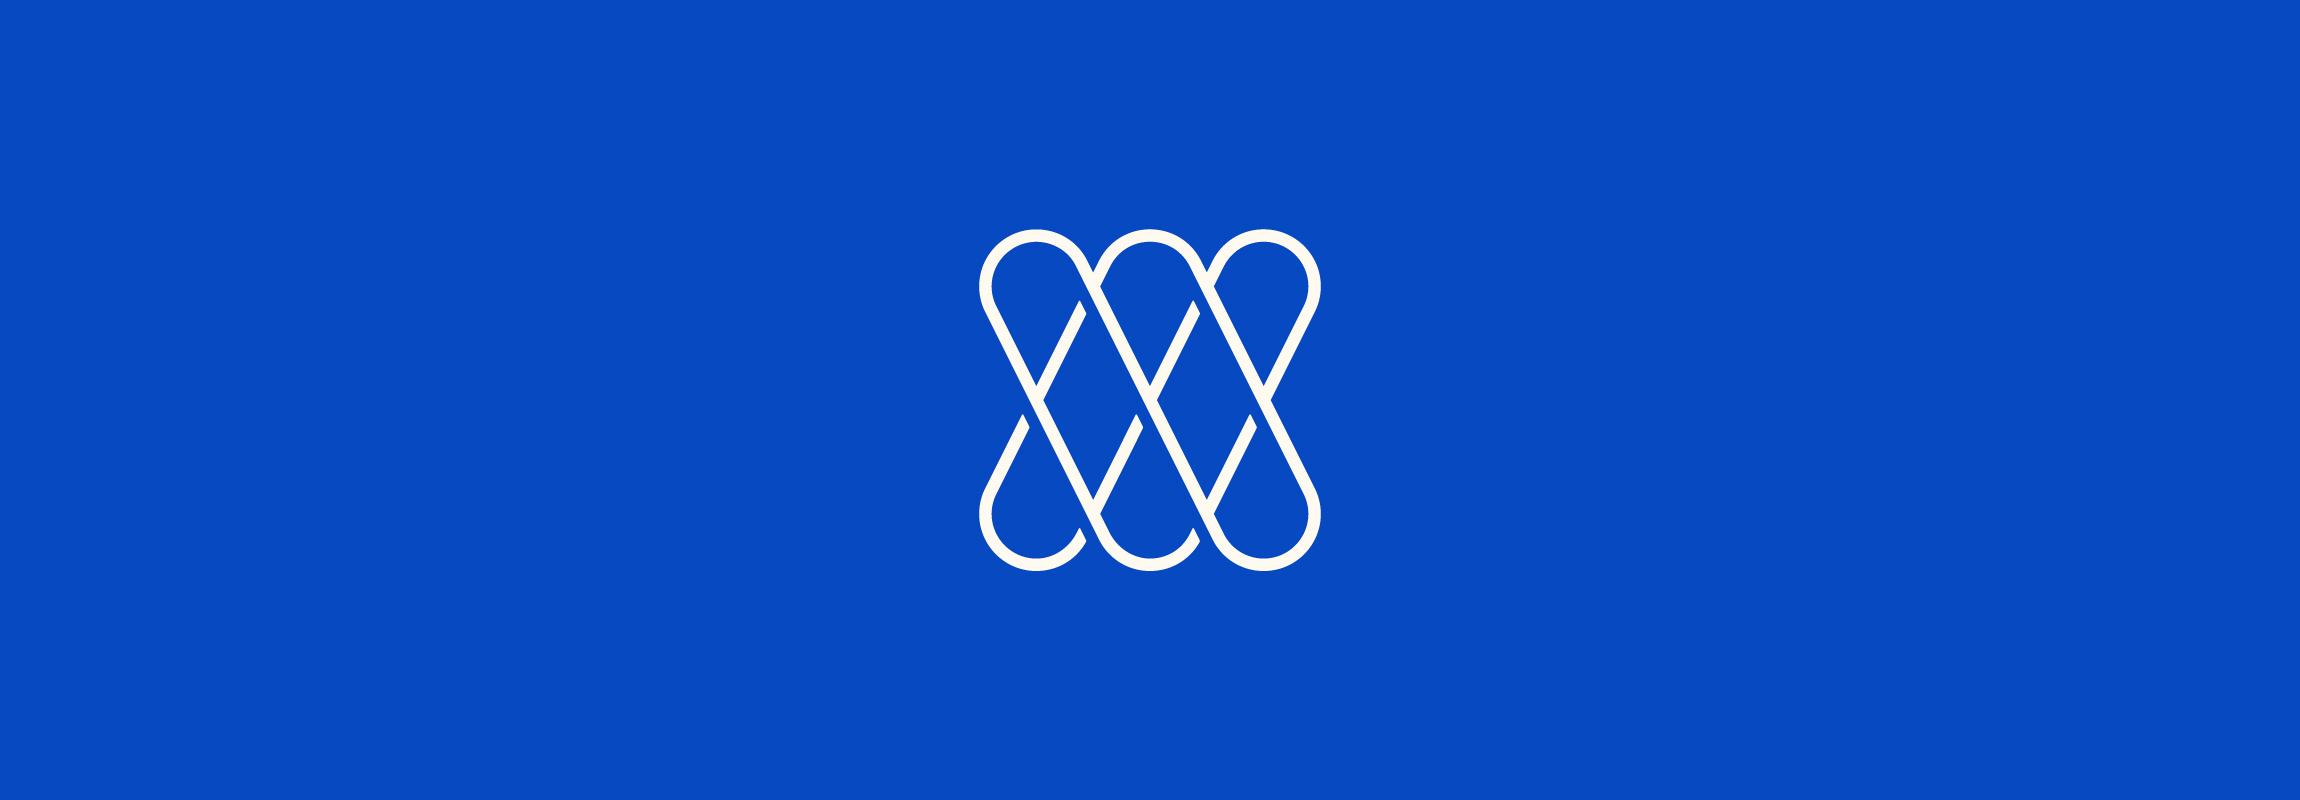 vilagestio_2-logo